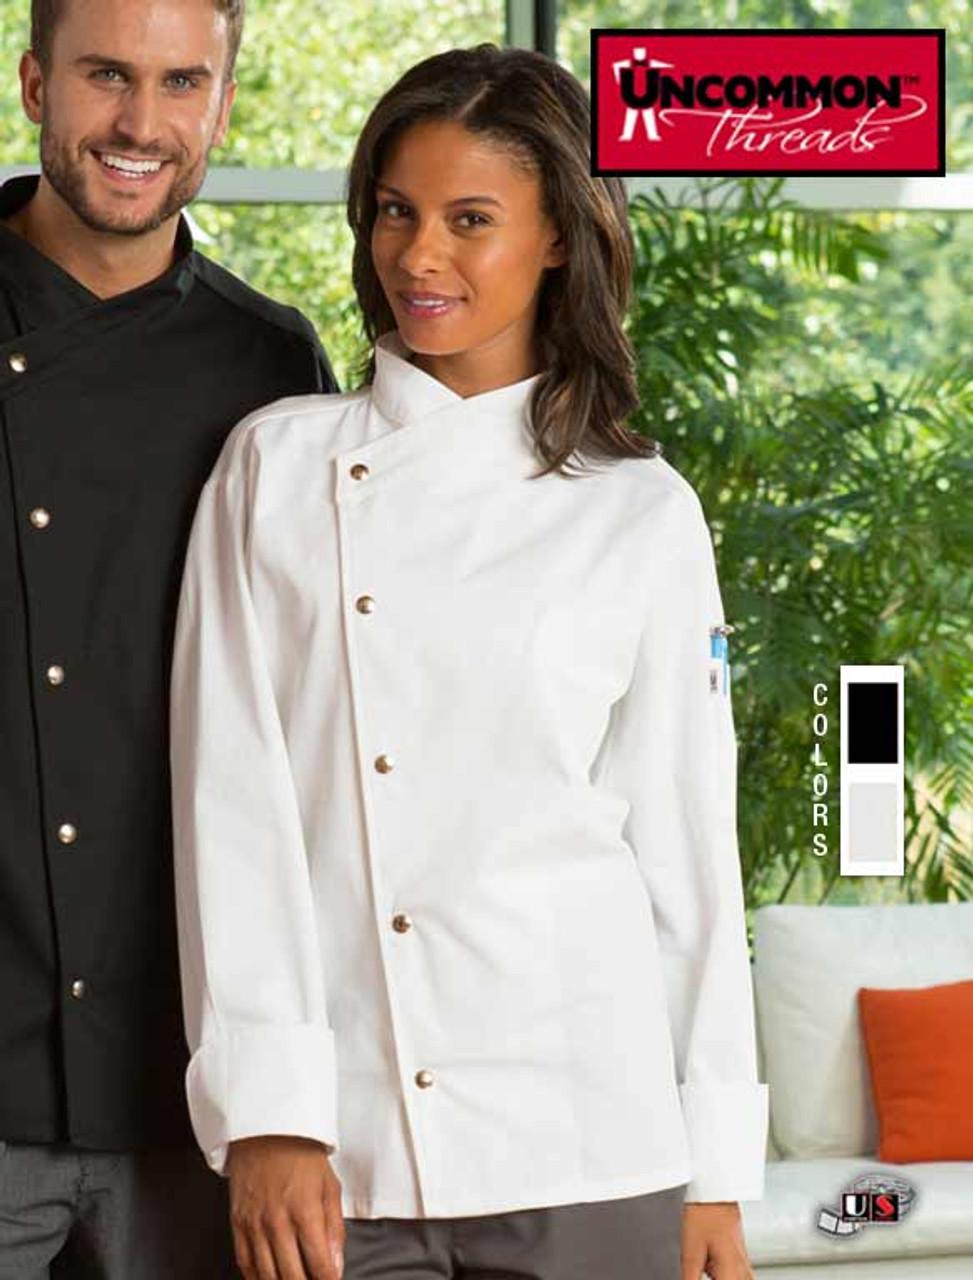 Uncommon Threads Unisex Chef Coat Jacket CALIENTE color White 0492 size Medium